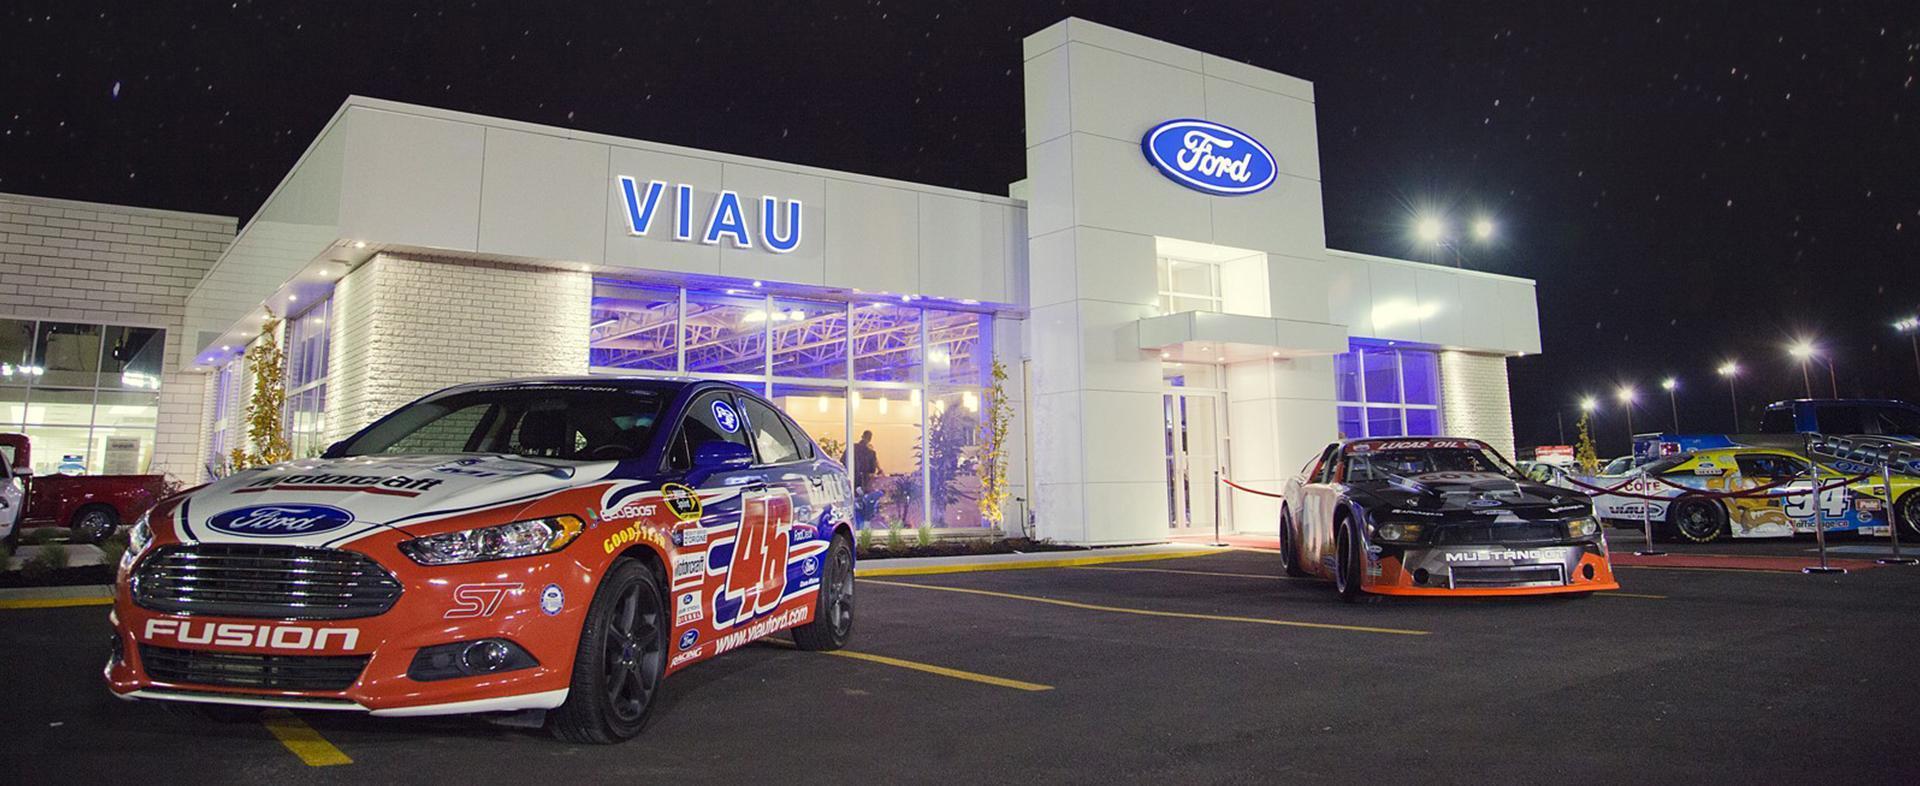 Viau Ford Concessionnaire